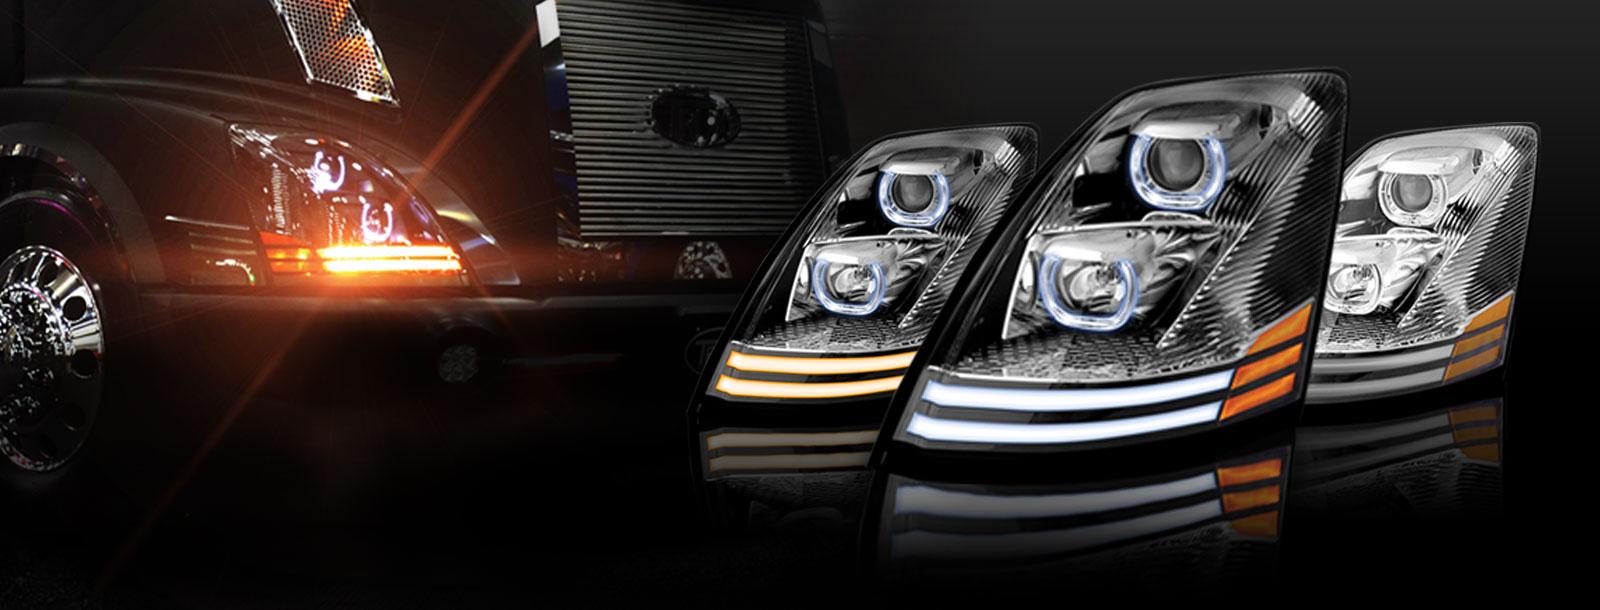 Trux Accessories Volvo Headlights